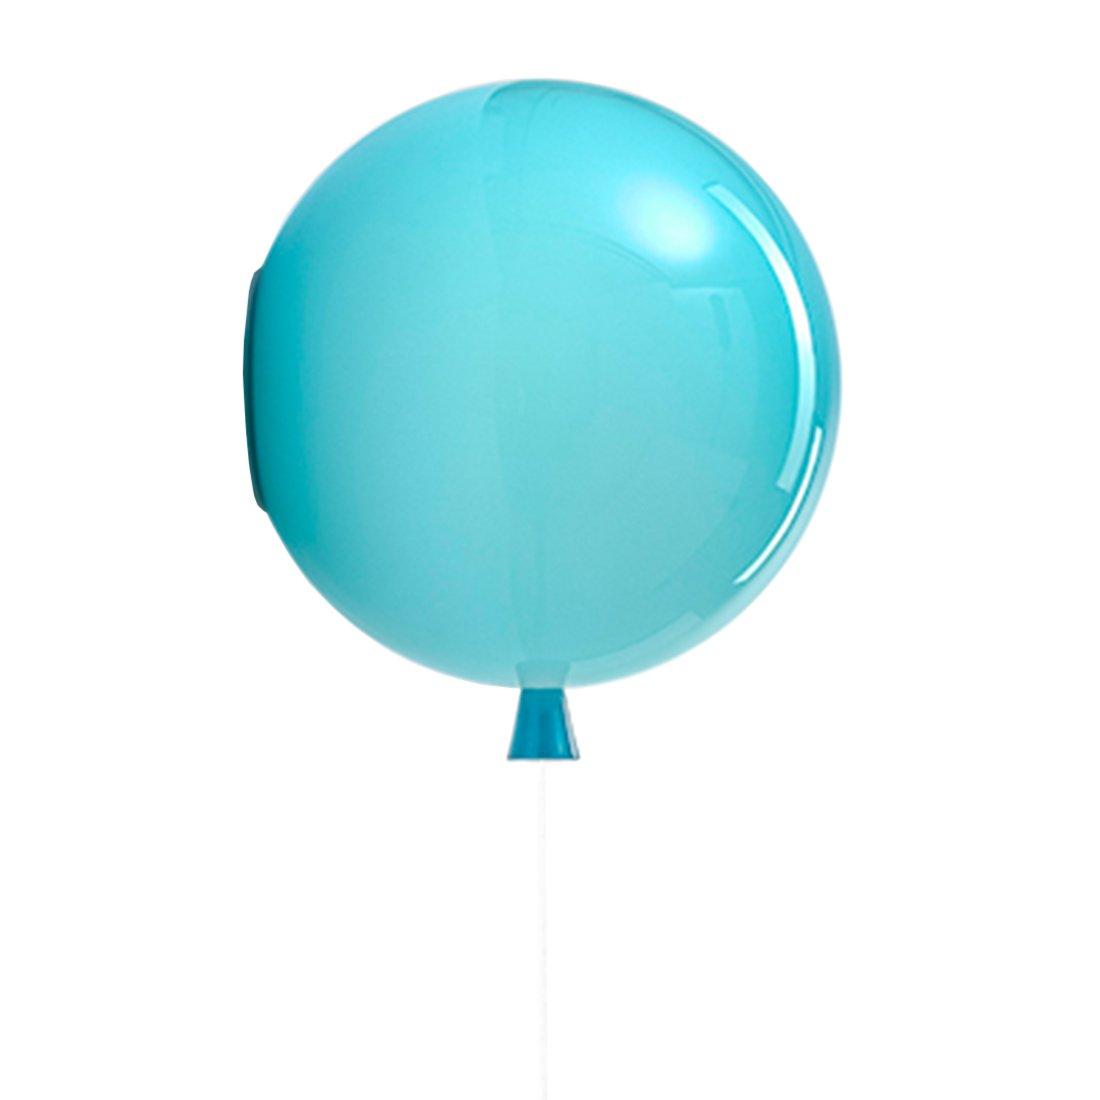 Brokis Memory Wandlamp Large Glossy Turquoise